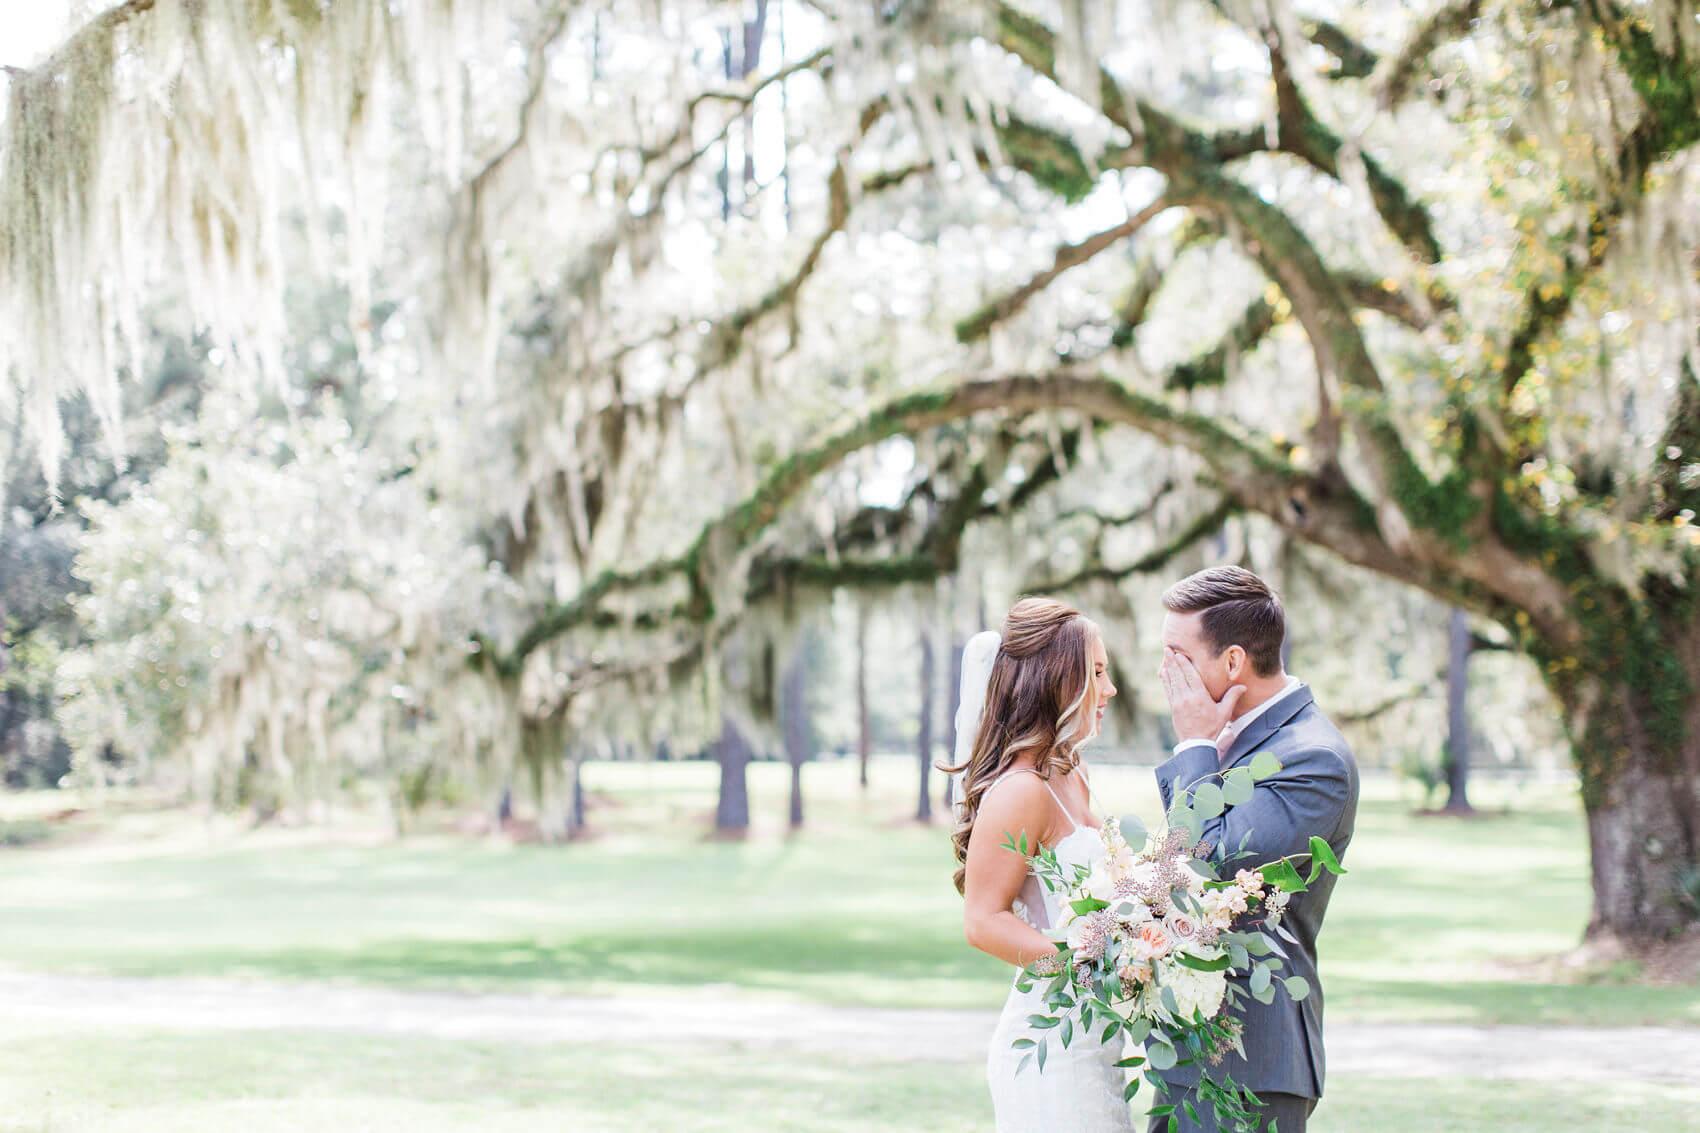 Apt-b-photography-savannah-wedding-photographer-savannah-wedding-hilton-head-wedding-photographer-14.jpg